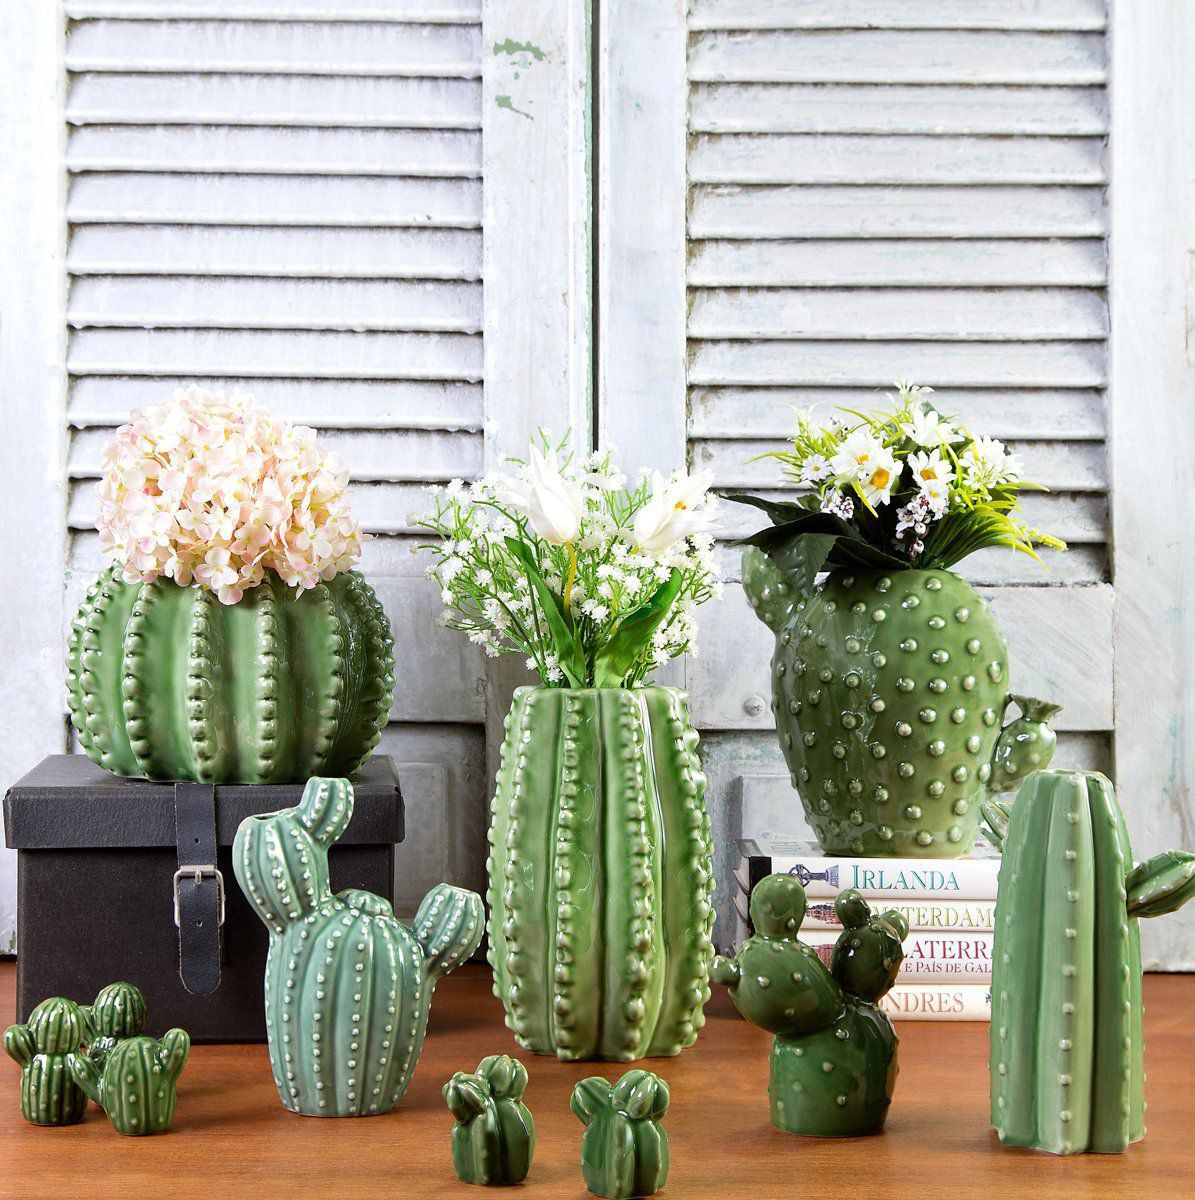 Cachepô de Cerâmica Barrel Cactus Verde 12,5cm x 18,5cm - 40395